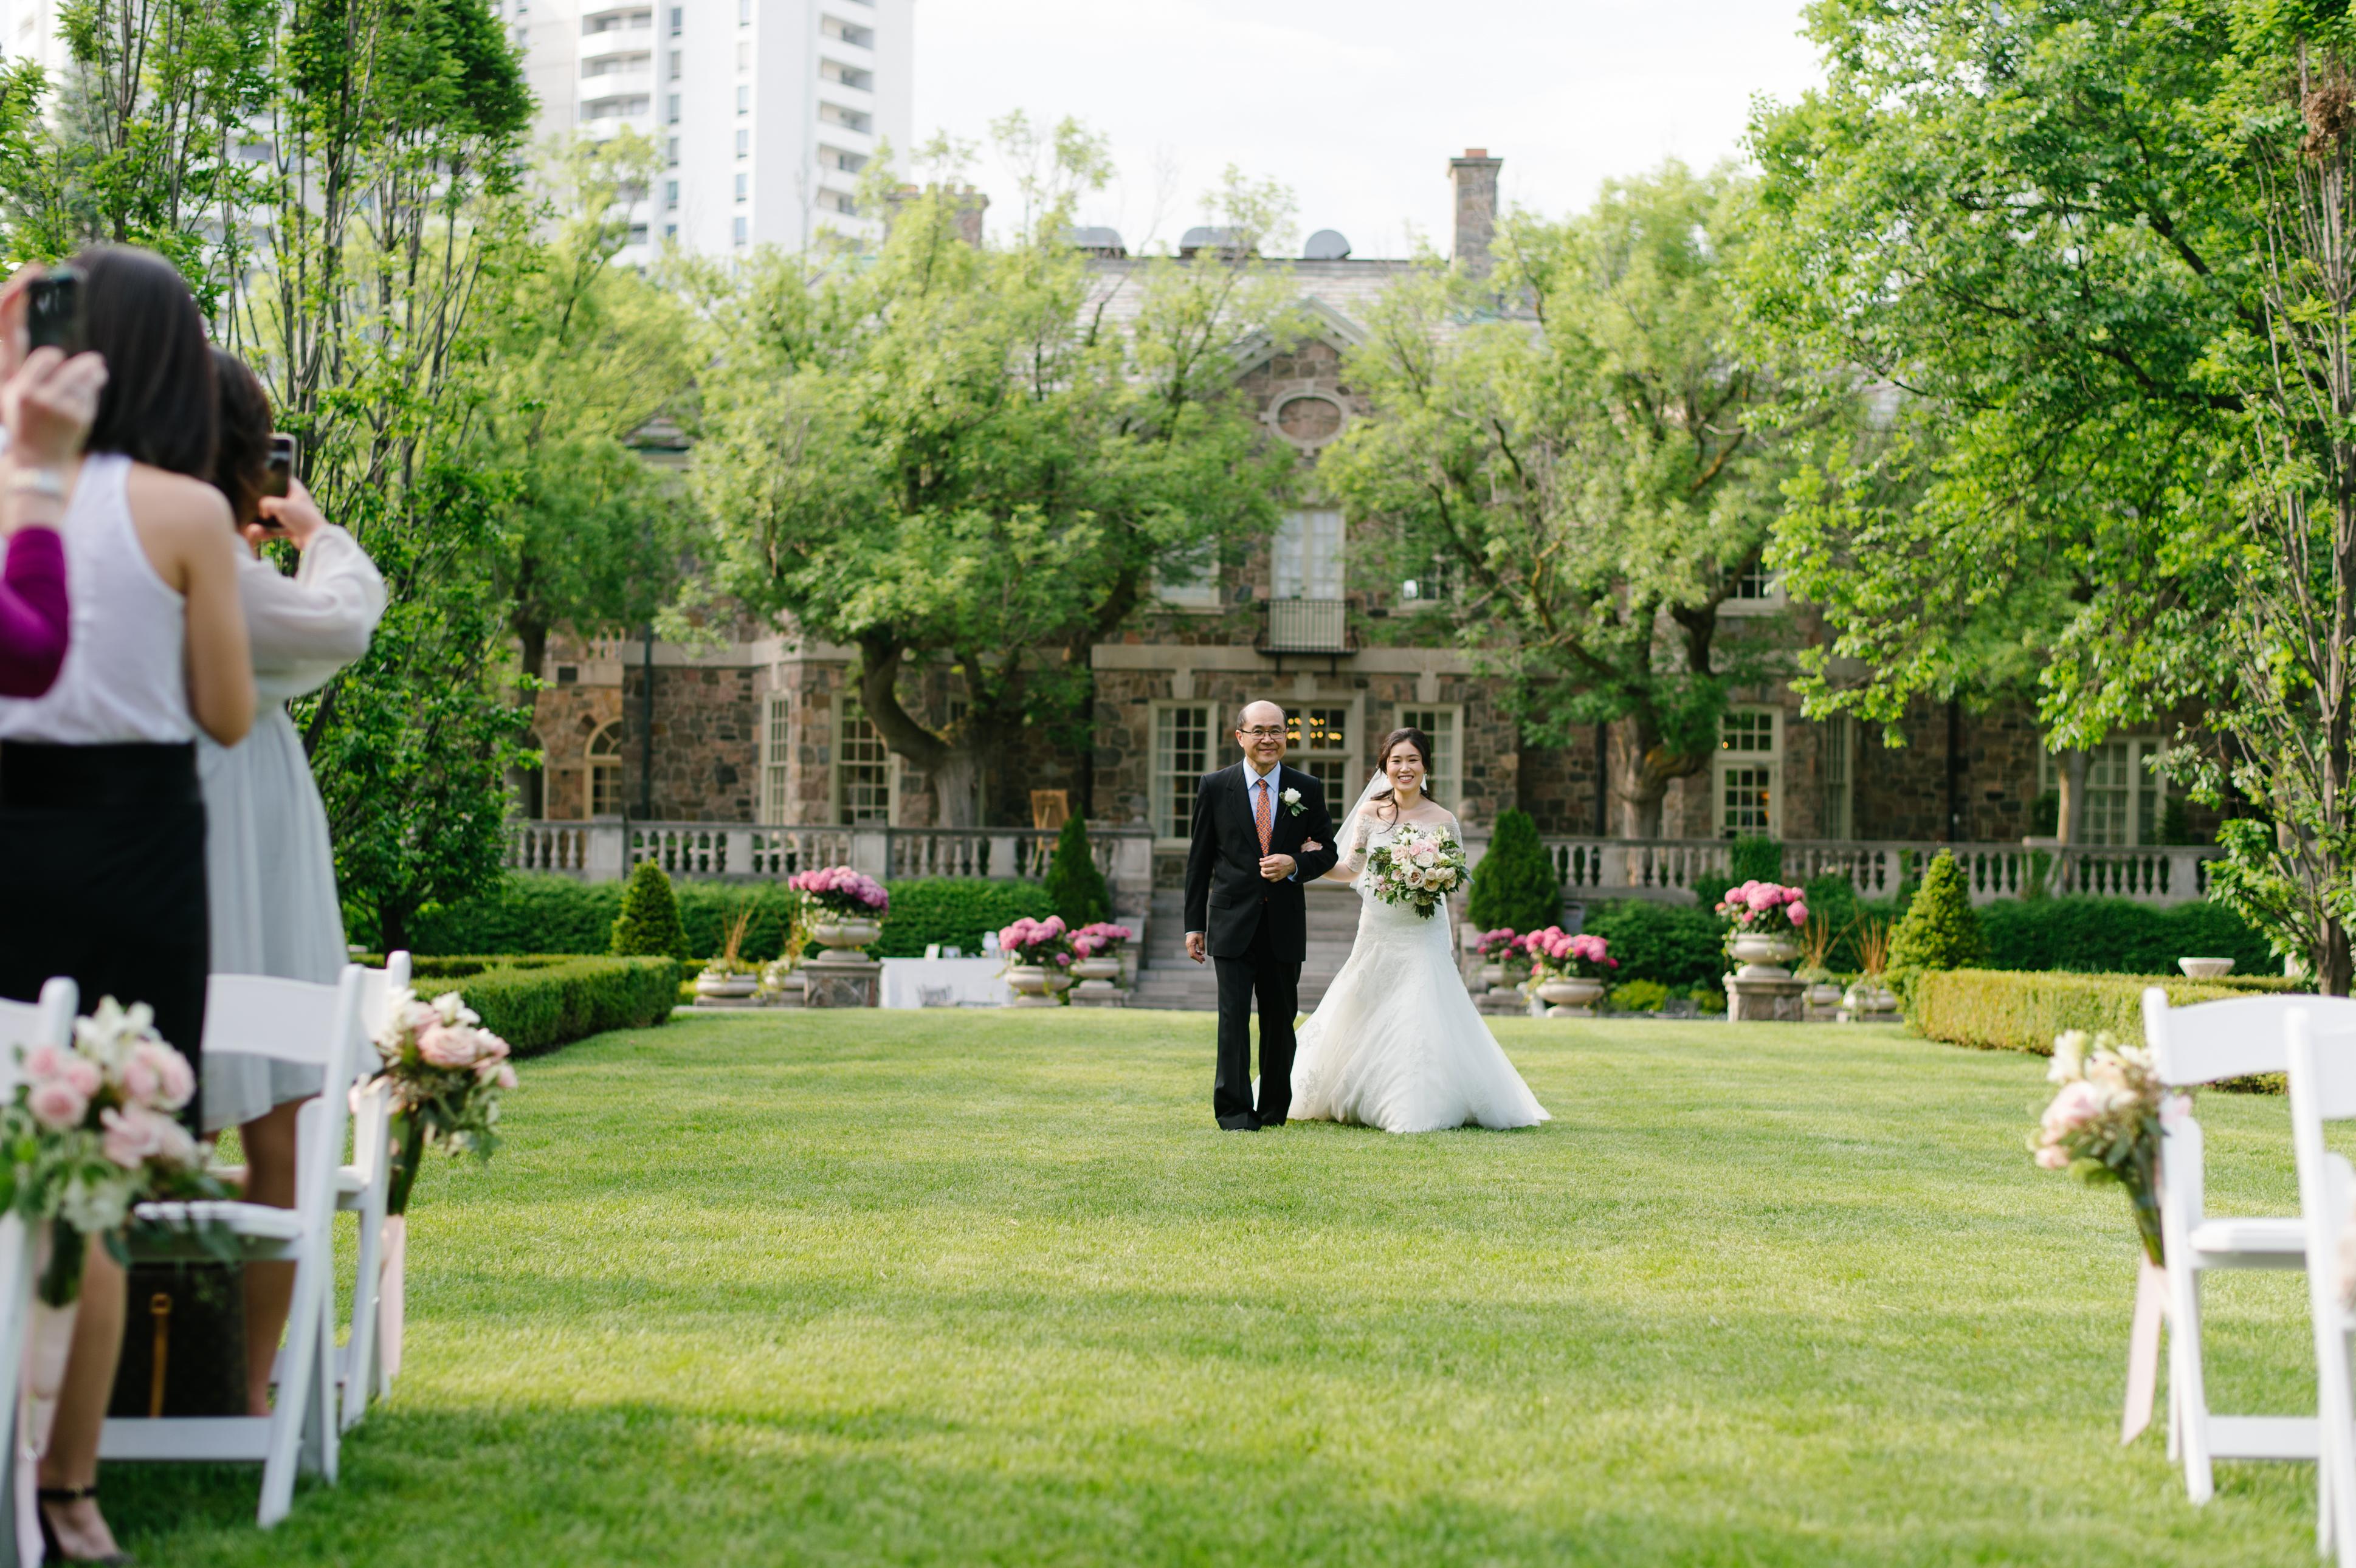 @rebeccachanweddings's cover photo for 'Graydon Hall Manor Wedding Venue Overview'